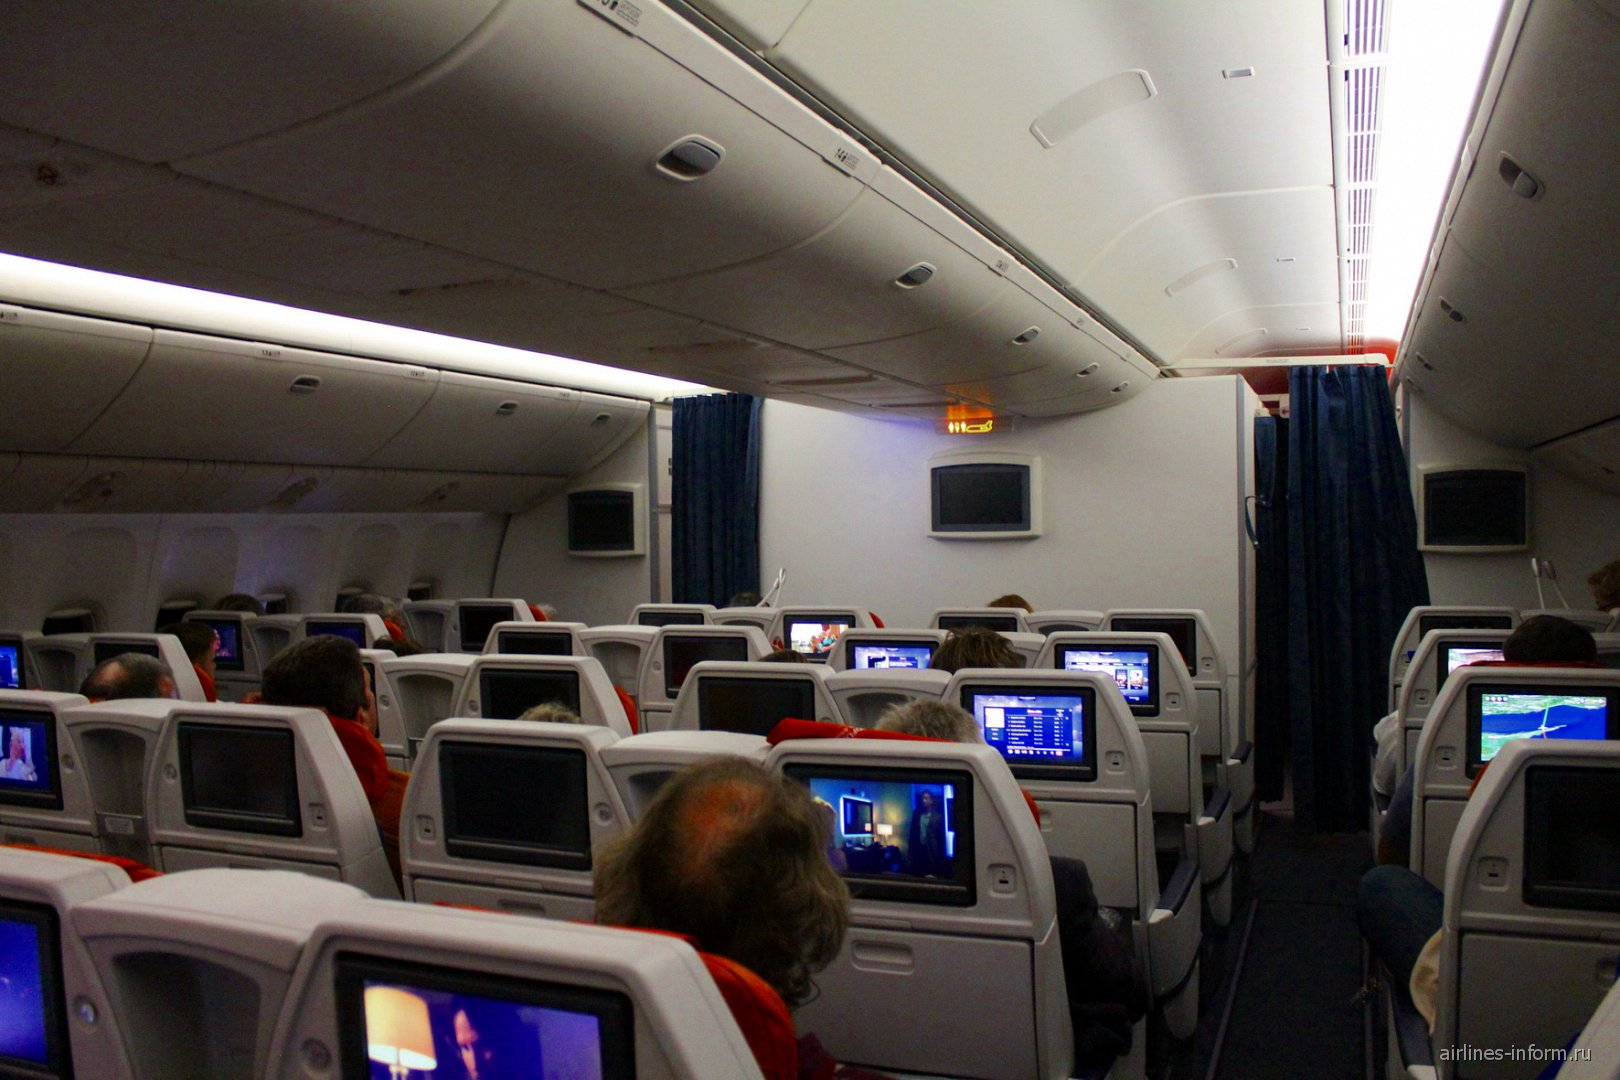 Салон комфорт-класса в самолете Боинг-777-300 Аэрофлота